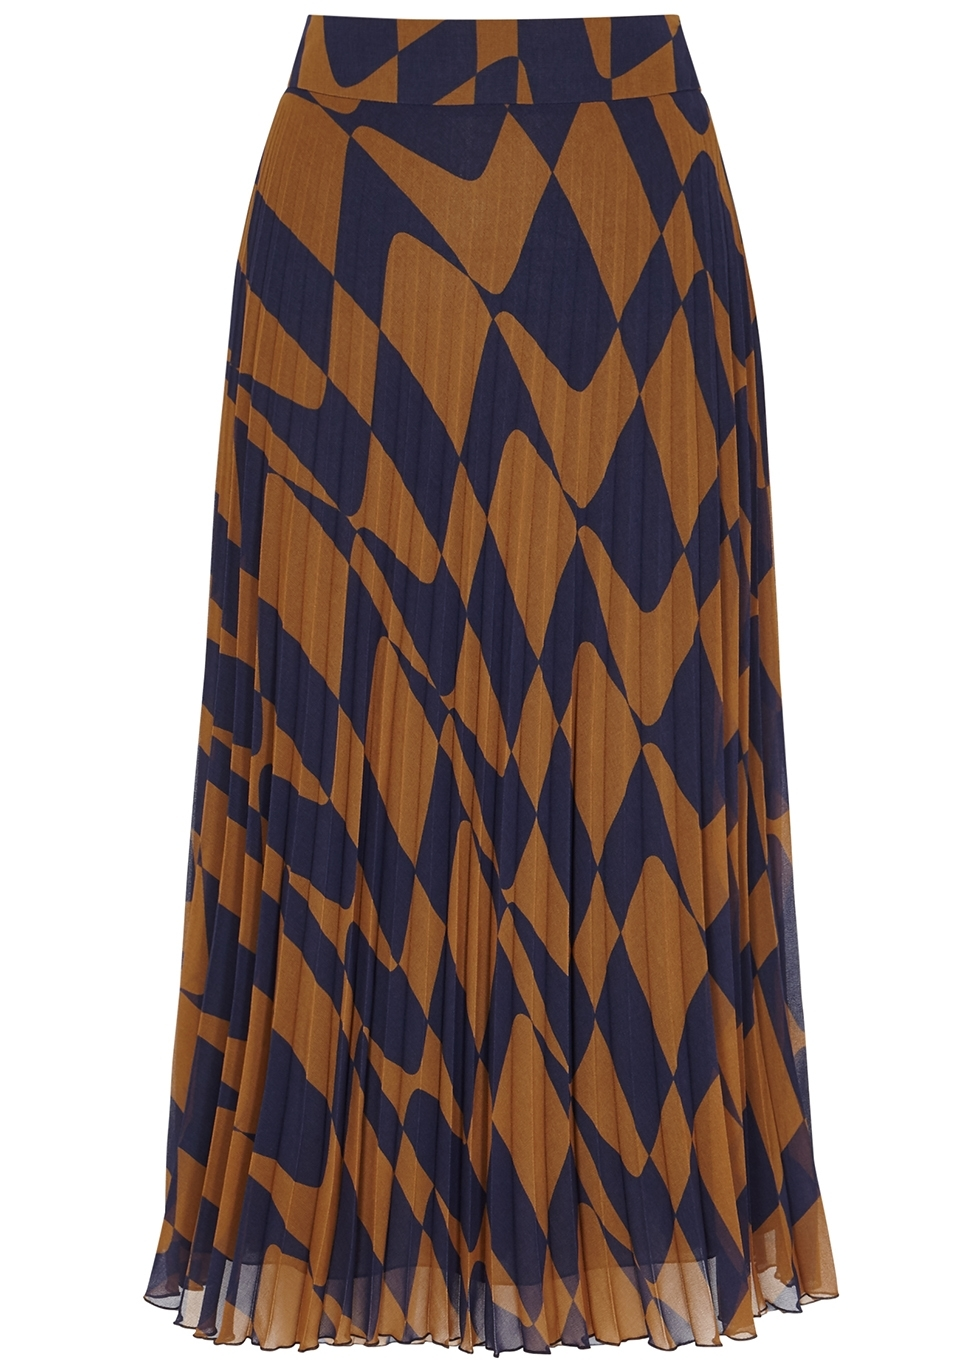 59f4d3e161f29 Women s Designer Skirts - Harvey Nichols